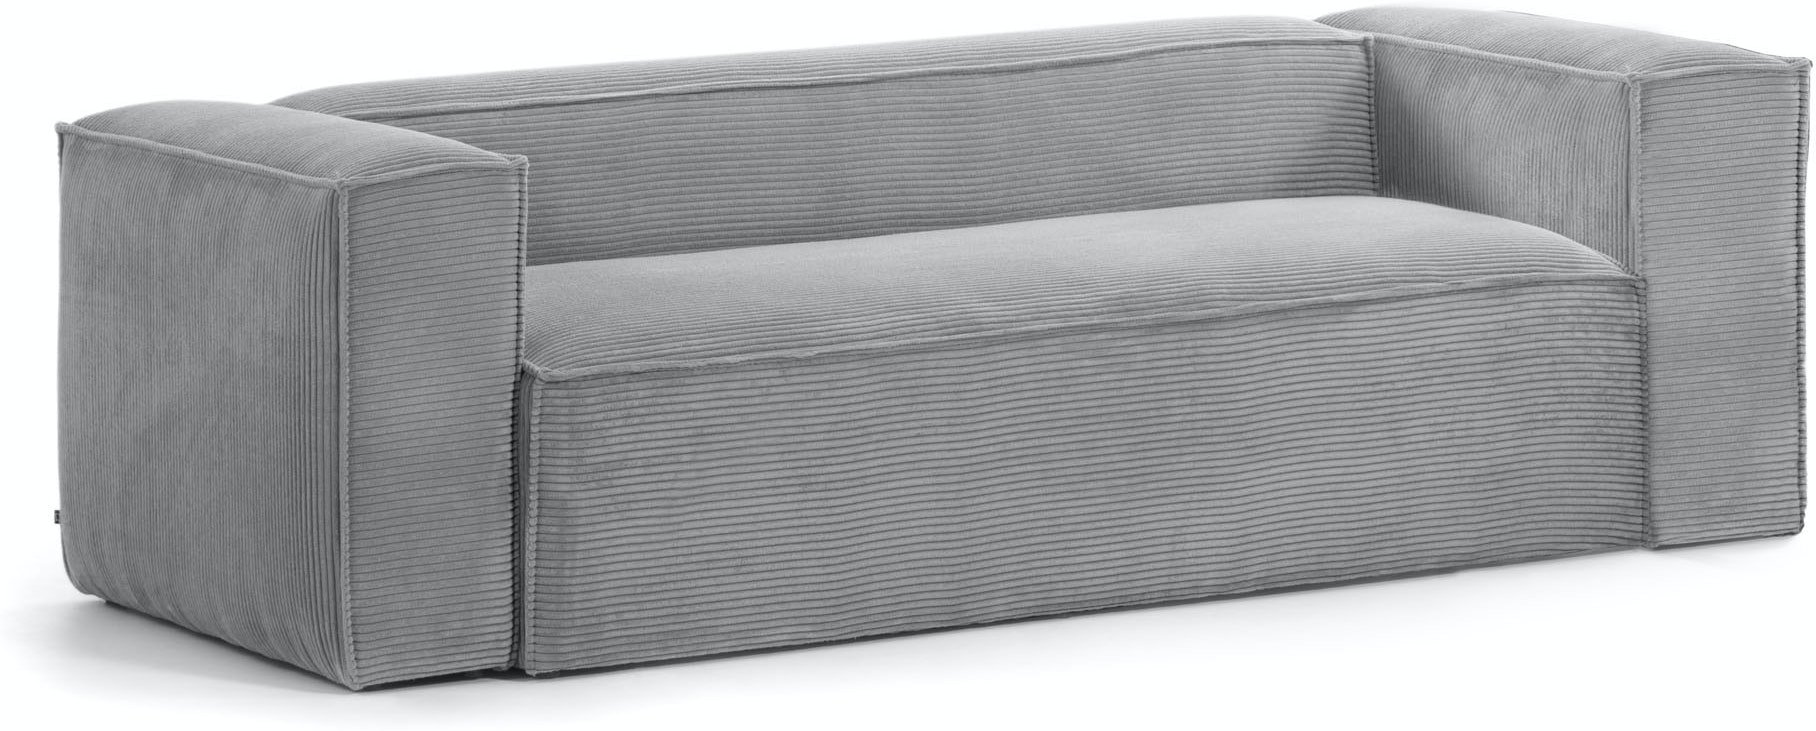 Blok, 3-personers sofa, Fjøjl by LaForma (H: 69 cm. B: 210 cm. L: 100 cm., Grå)